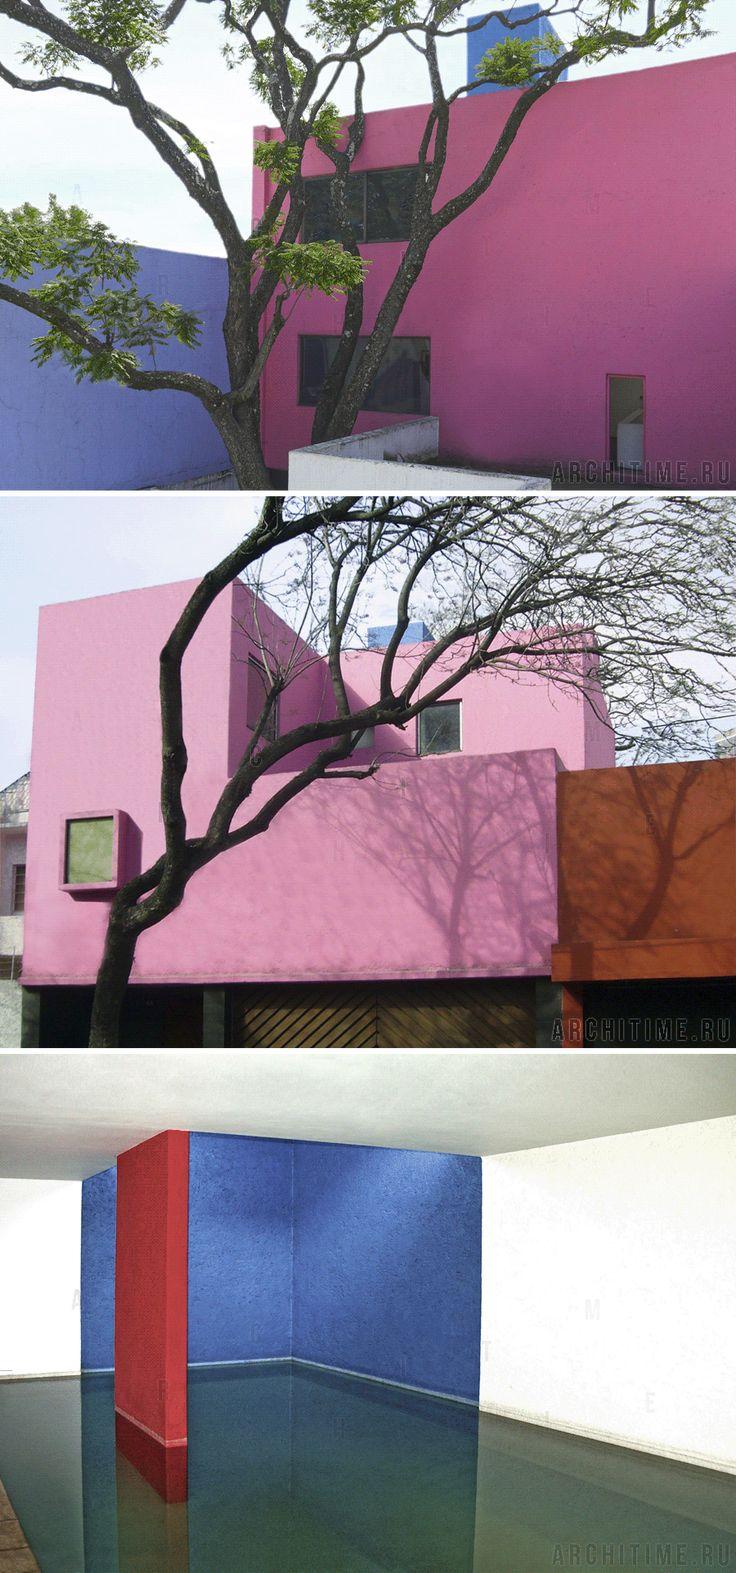 Дом Жиларди (Casa Gilardi). Мехико, Мексика  (1975-1977 гг.)